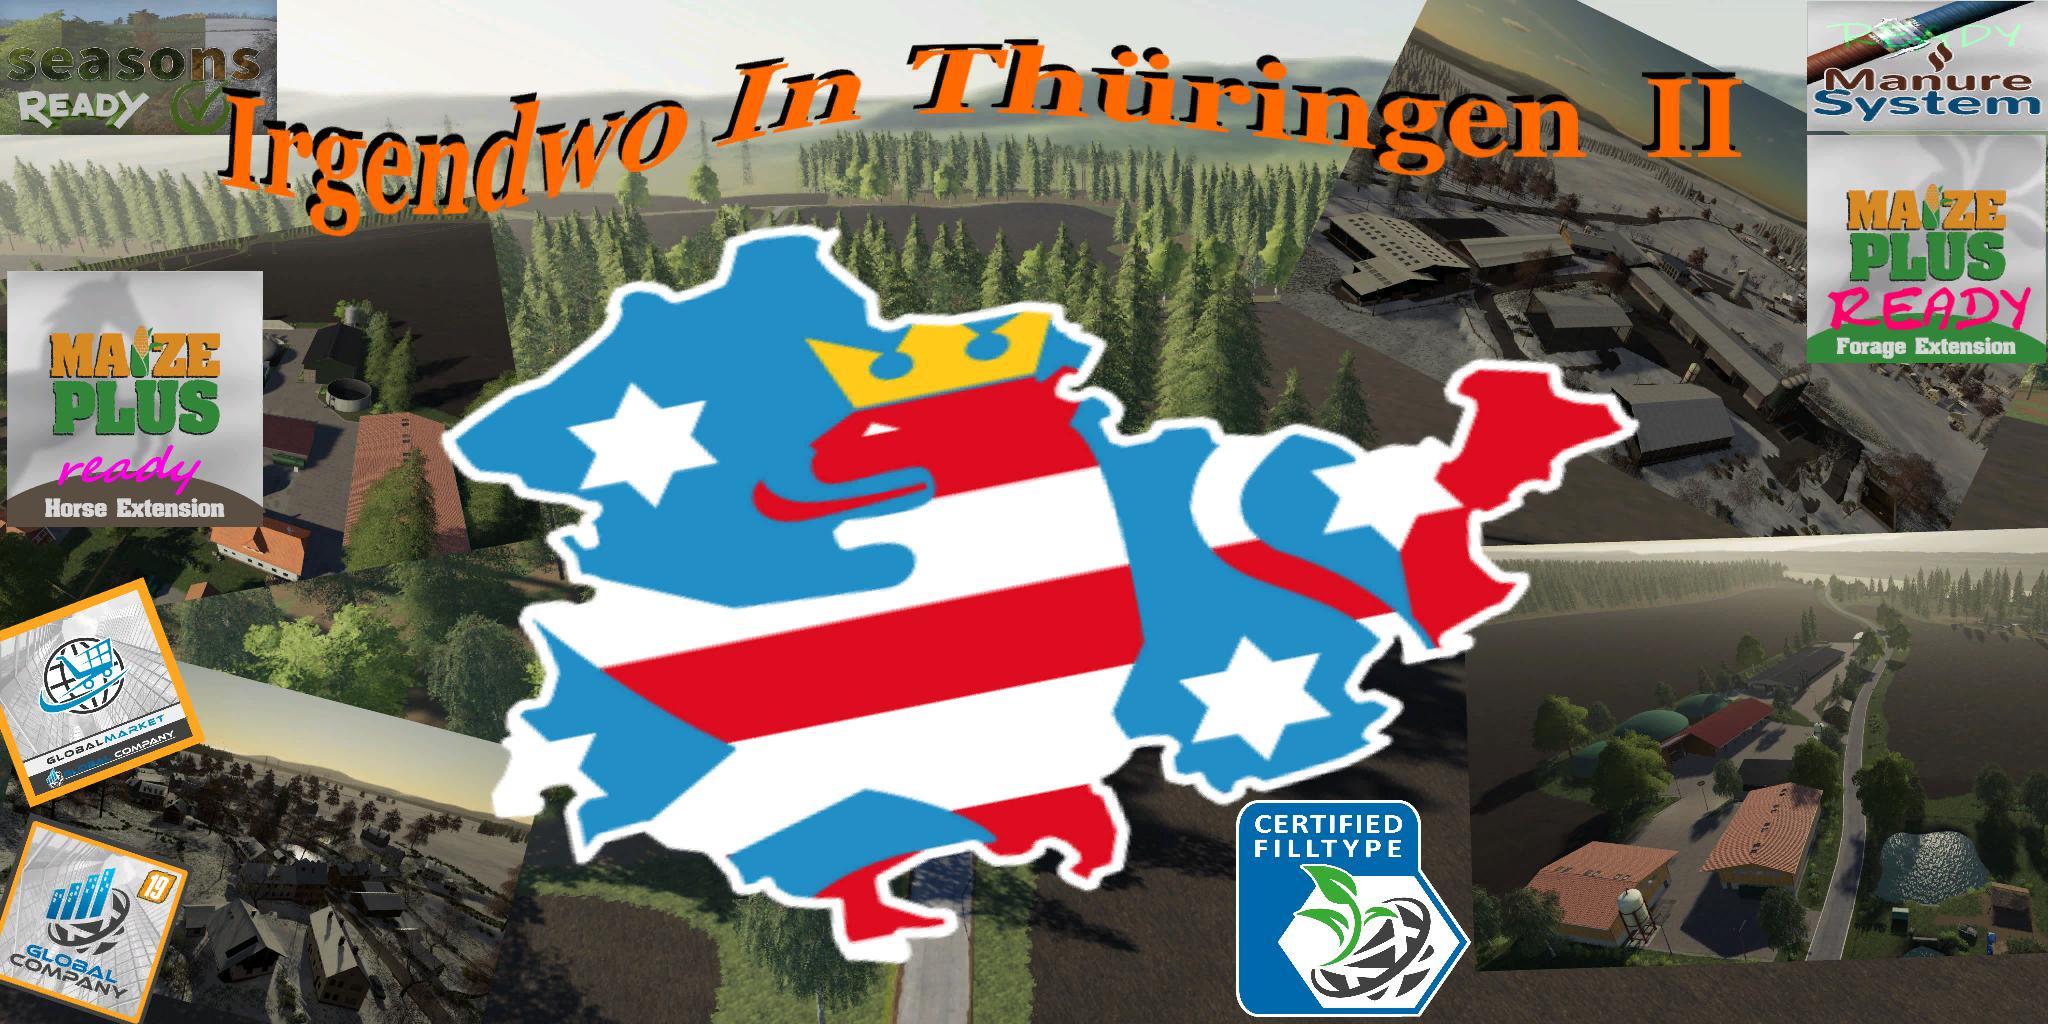 FS19 - Irgendwo in Thuringen II Map V3.0